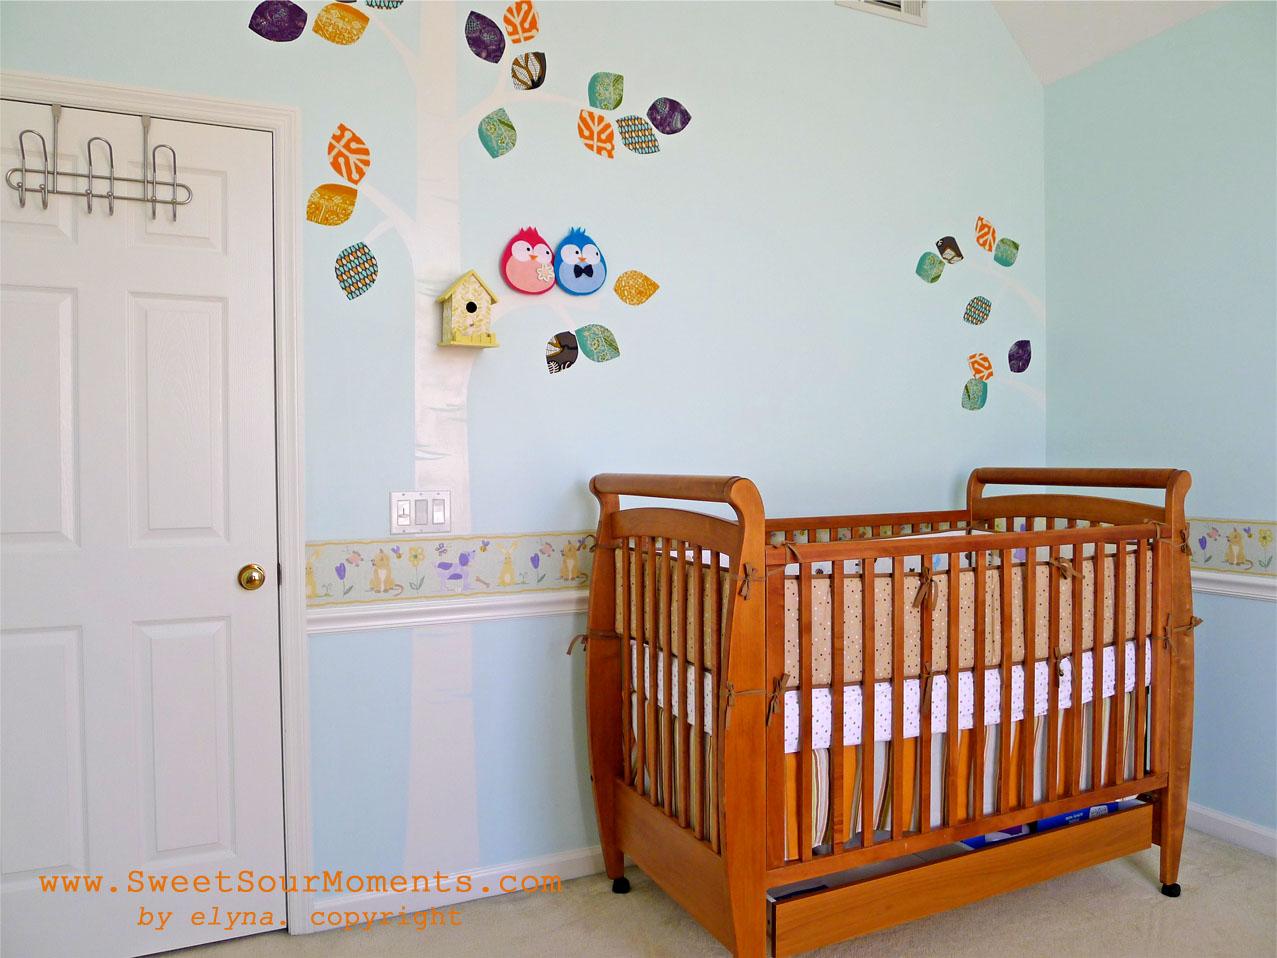 Baby Nursery part 1 Wall Mural DIY SweetSourMoments : baby nursery wall 1 from sweetsourmoments.com size 1277 x 958 jpeg 216kB